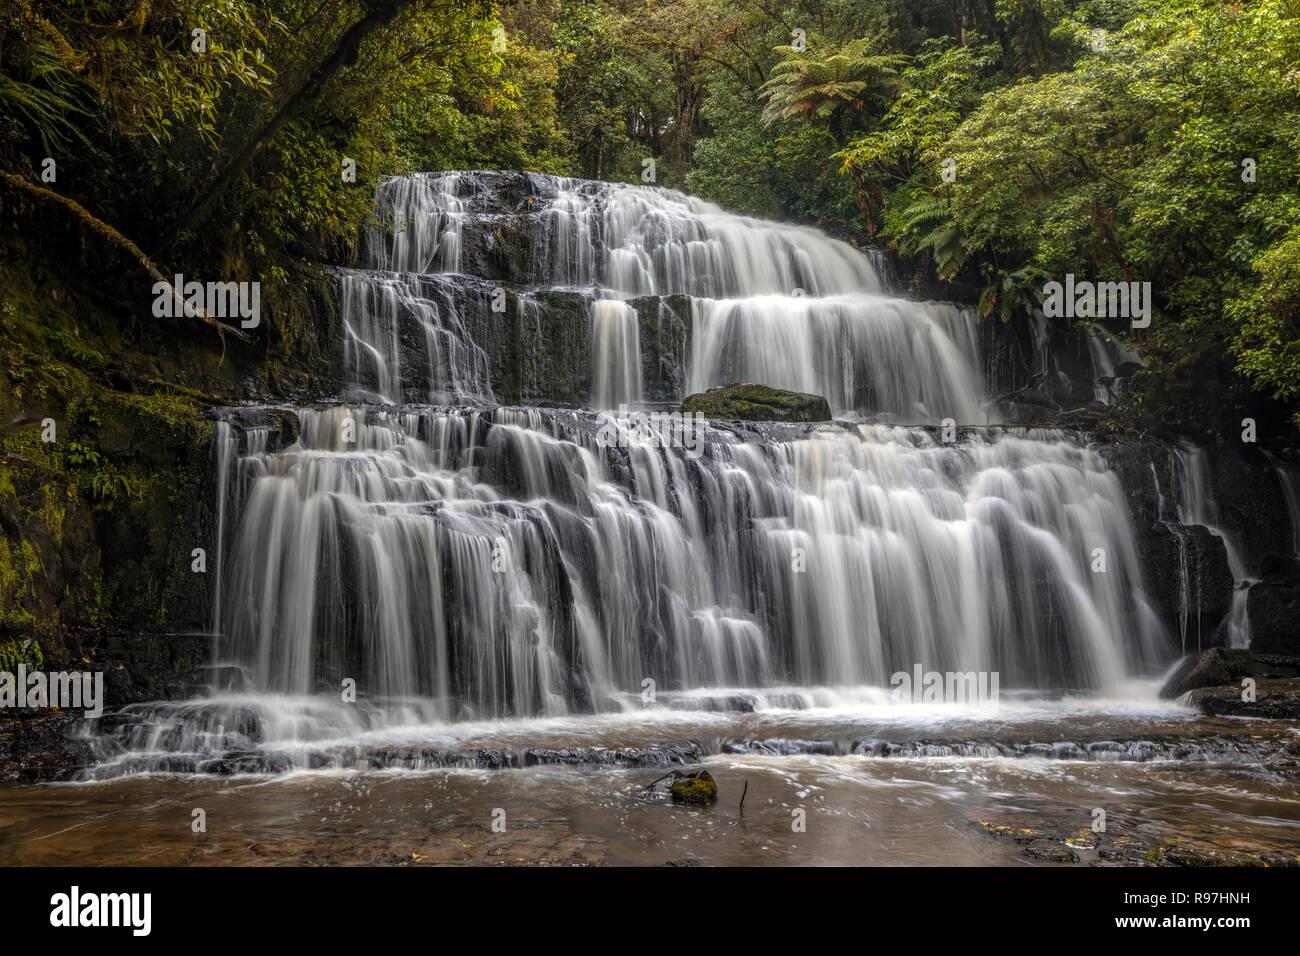 Purakaunui Falls, Catlins Forest Park, South Island, New Zealand Stock Photo